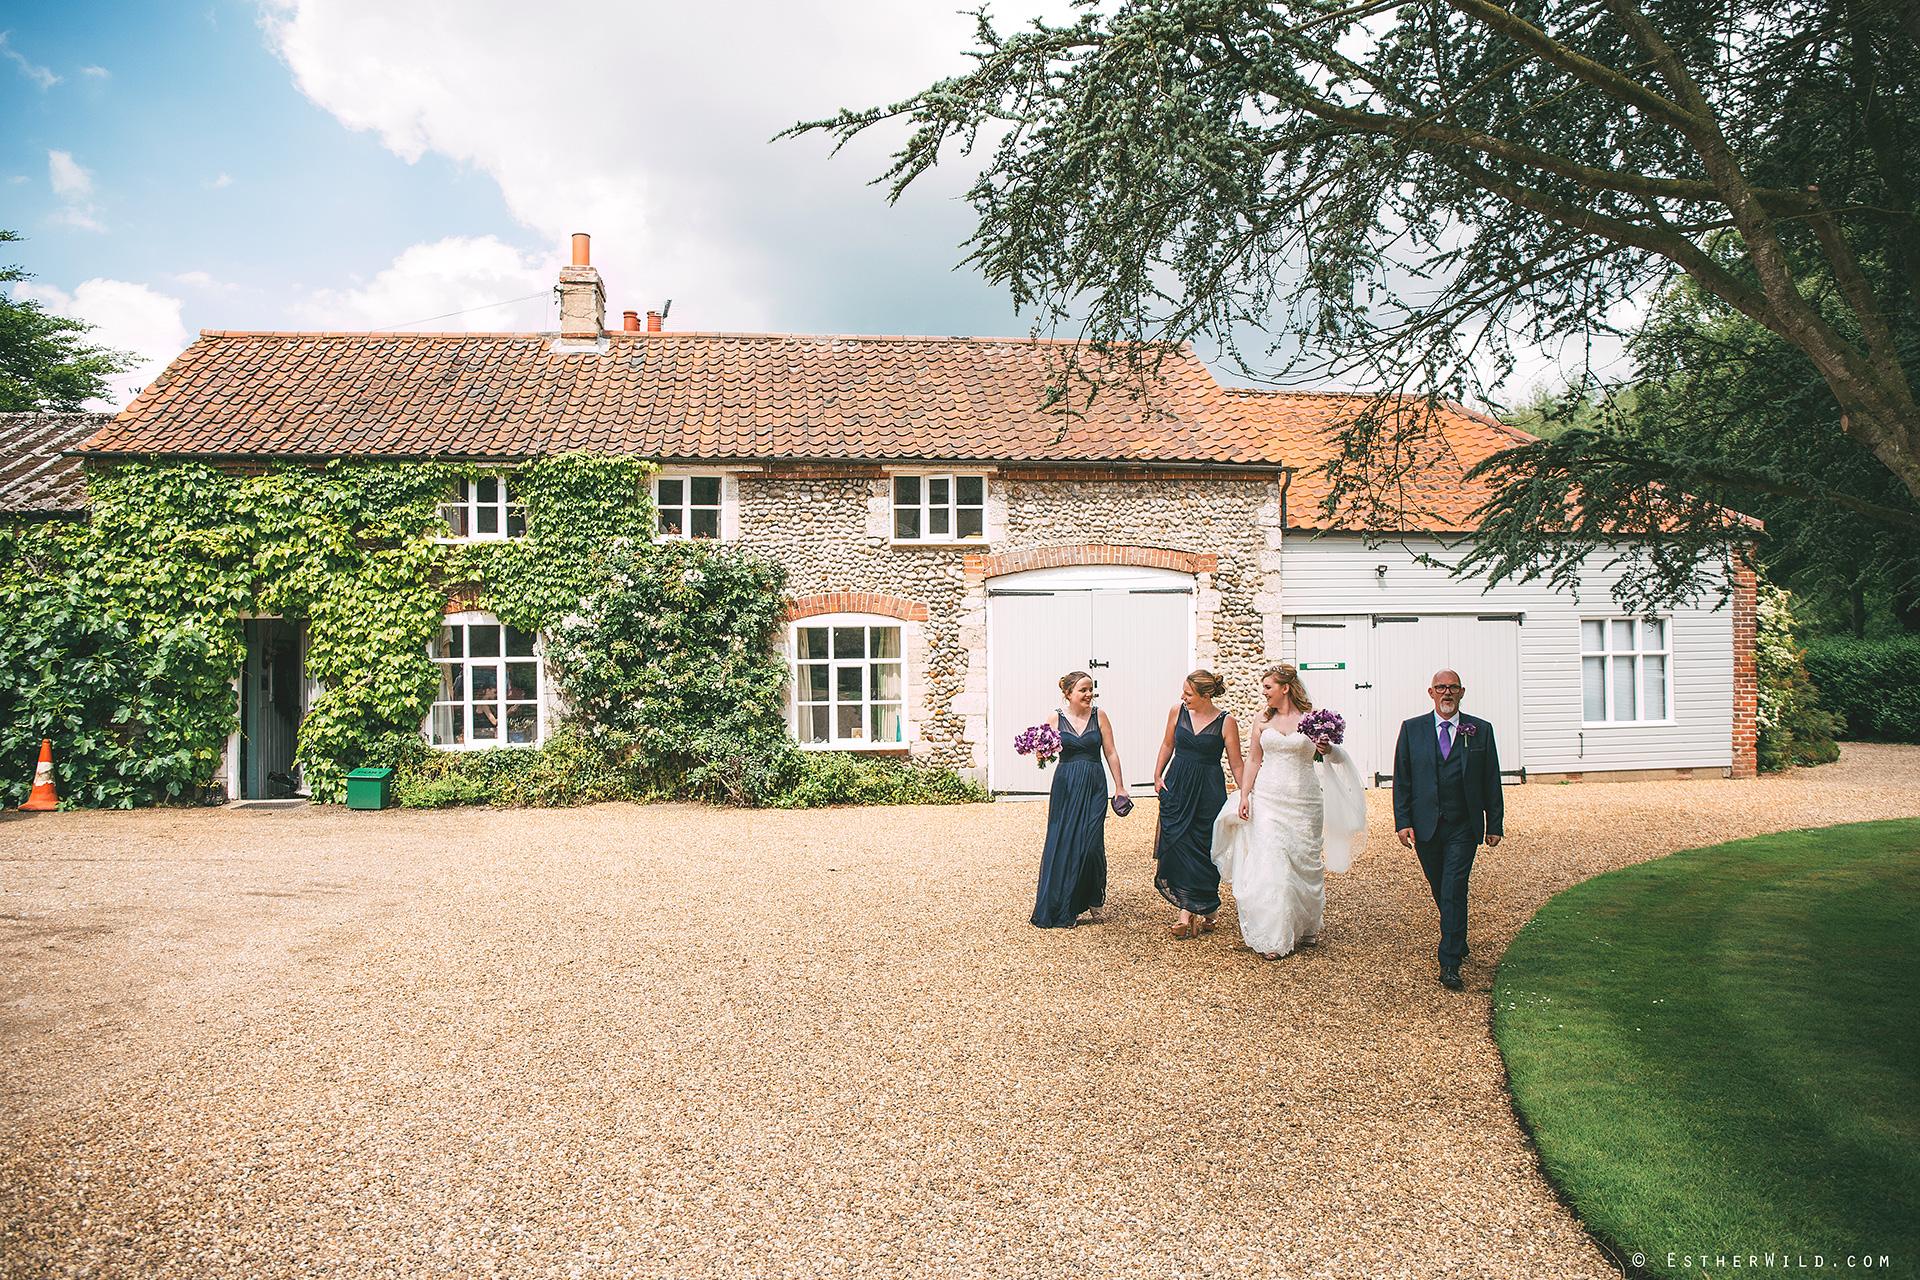 Norfolk_Wedding_Photographer_Mannington_Hall_Country_Esther_Wild_0884.jpg